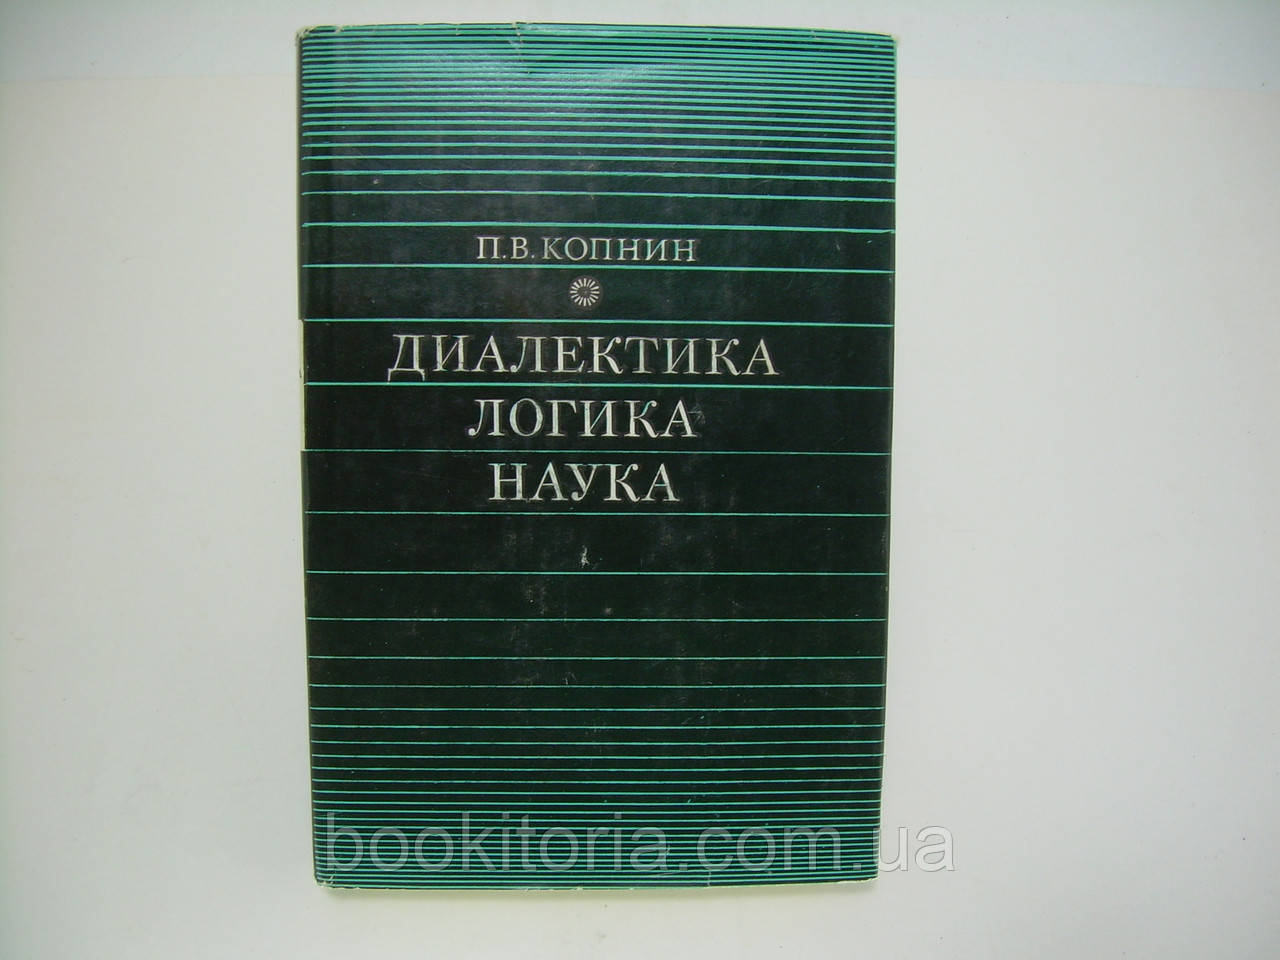 Копнин П.В. Диалектика, логика, наука (б/у).